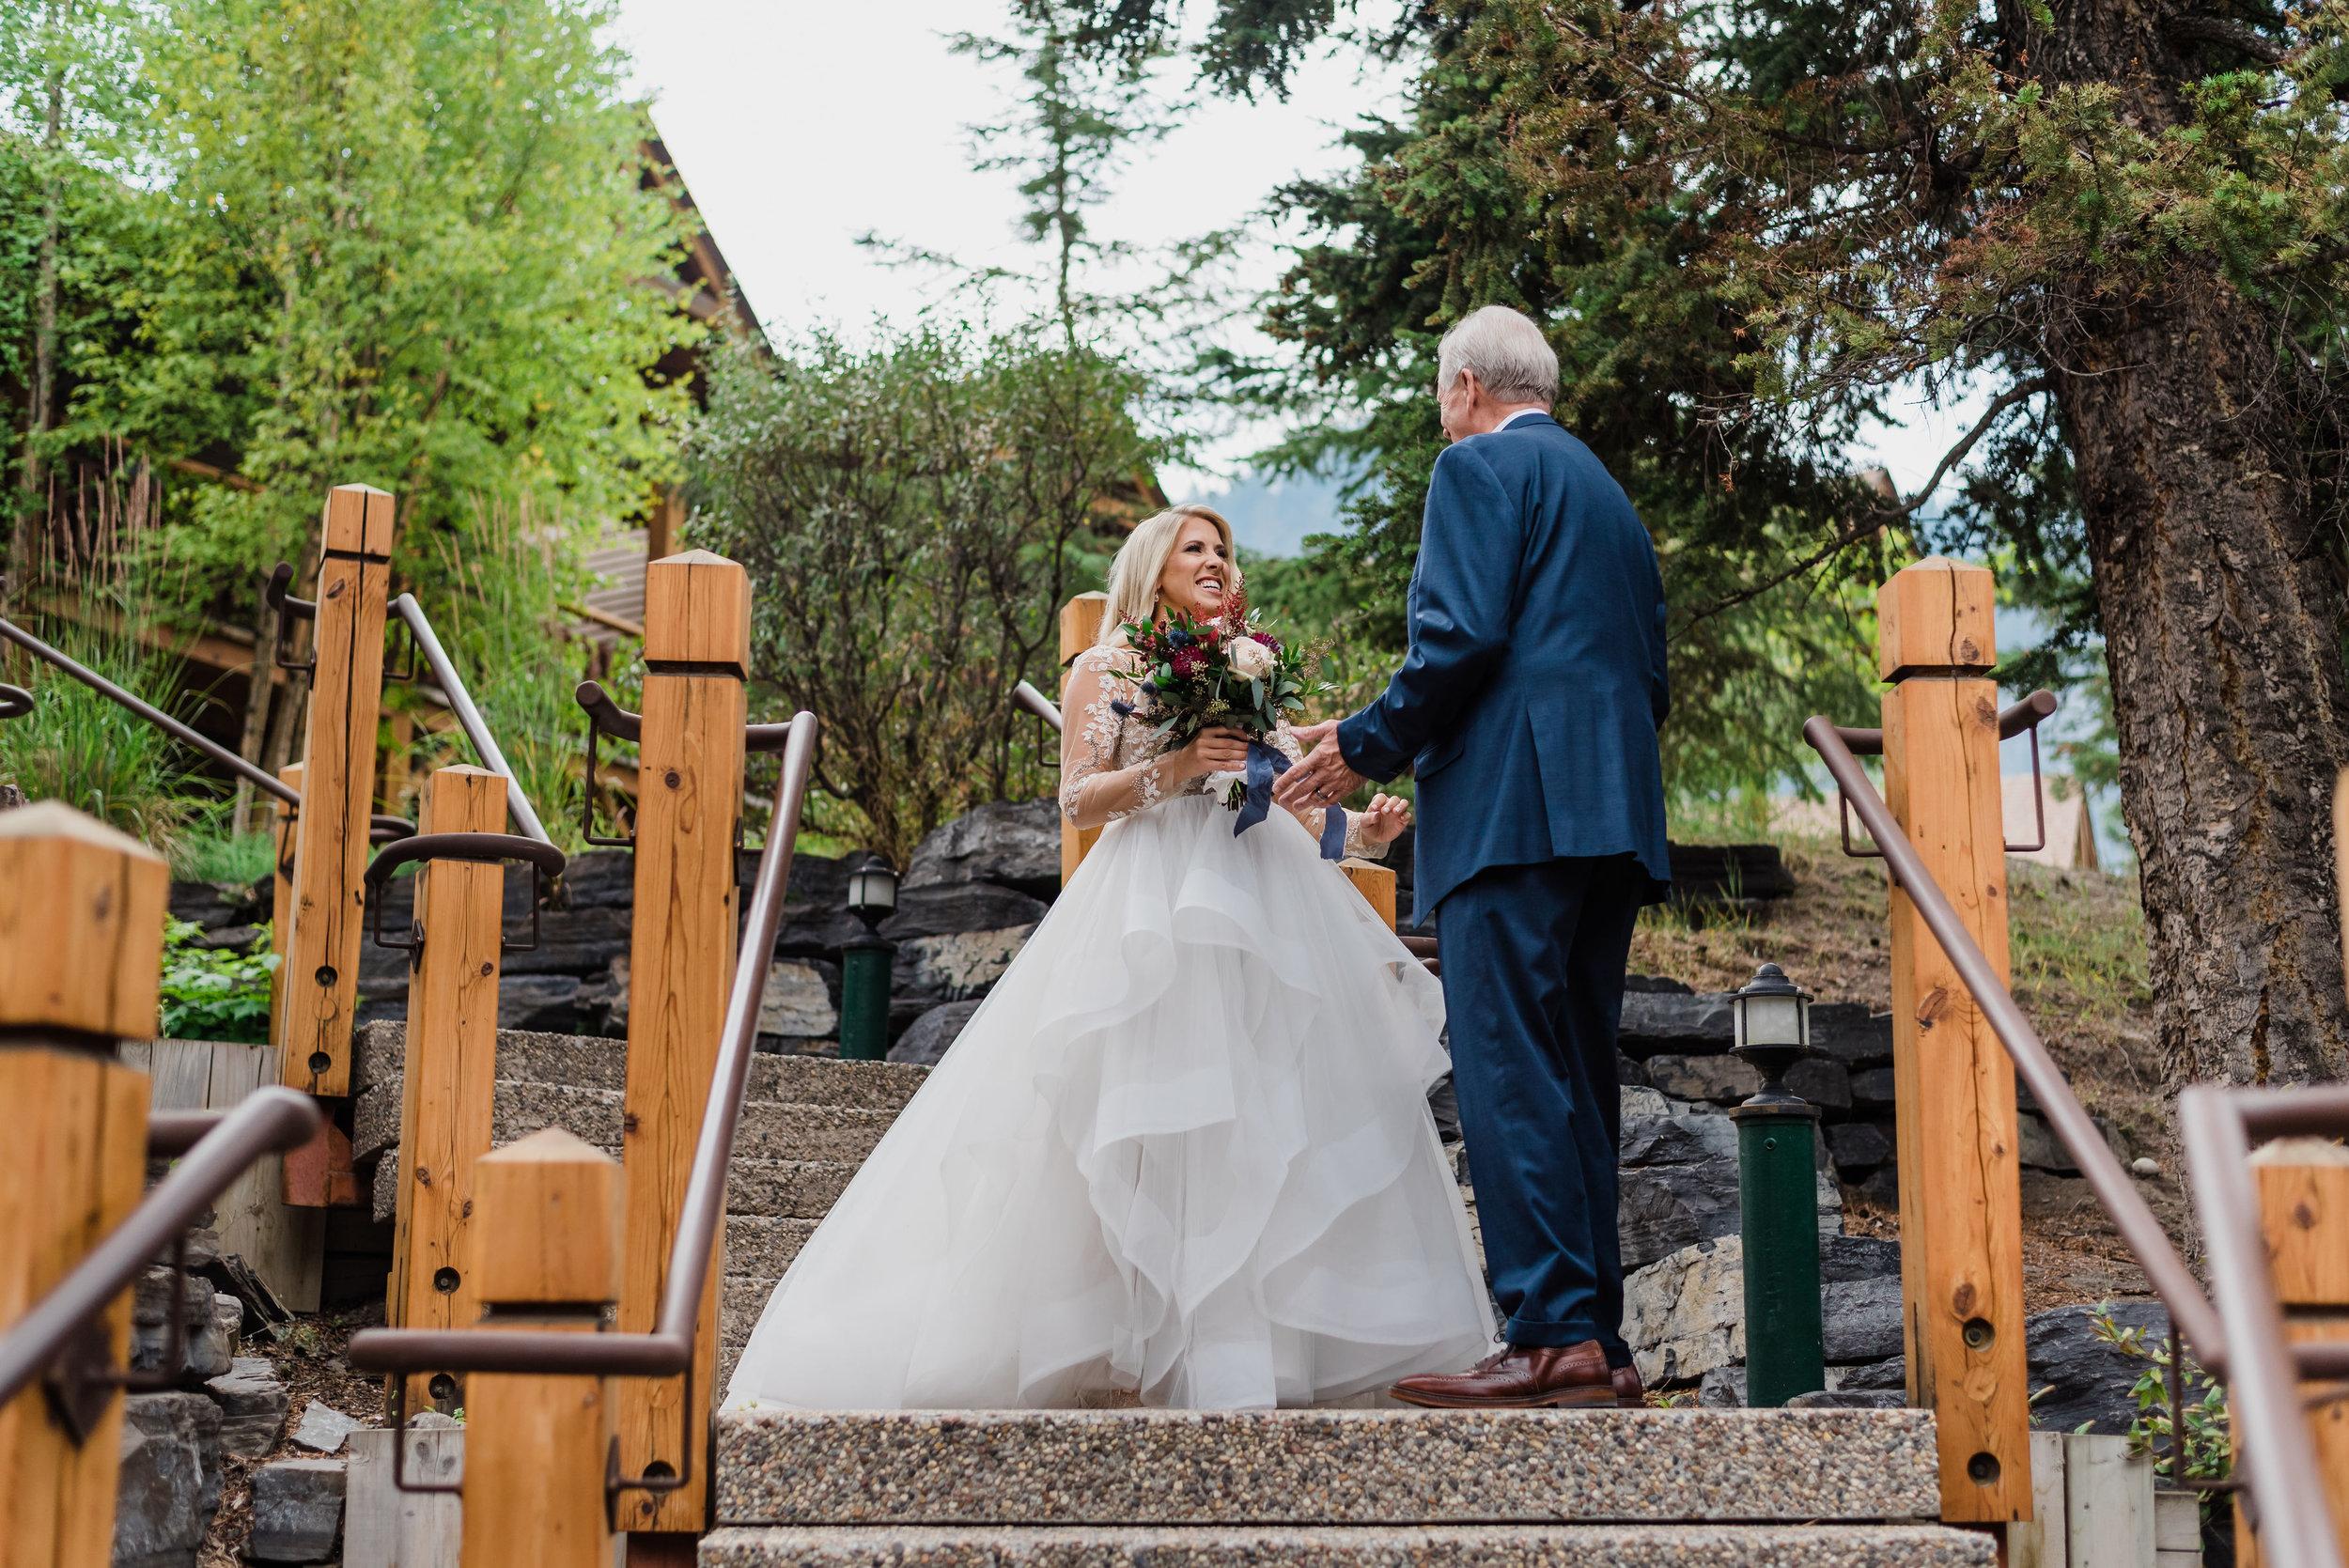 Kittleson_Wedding-174.jpg